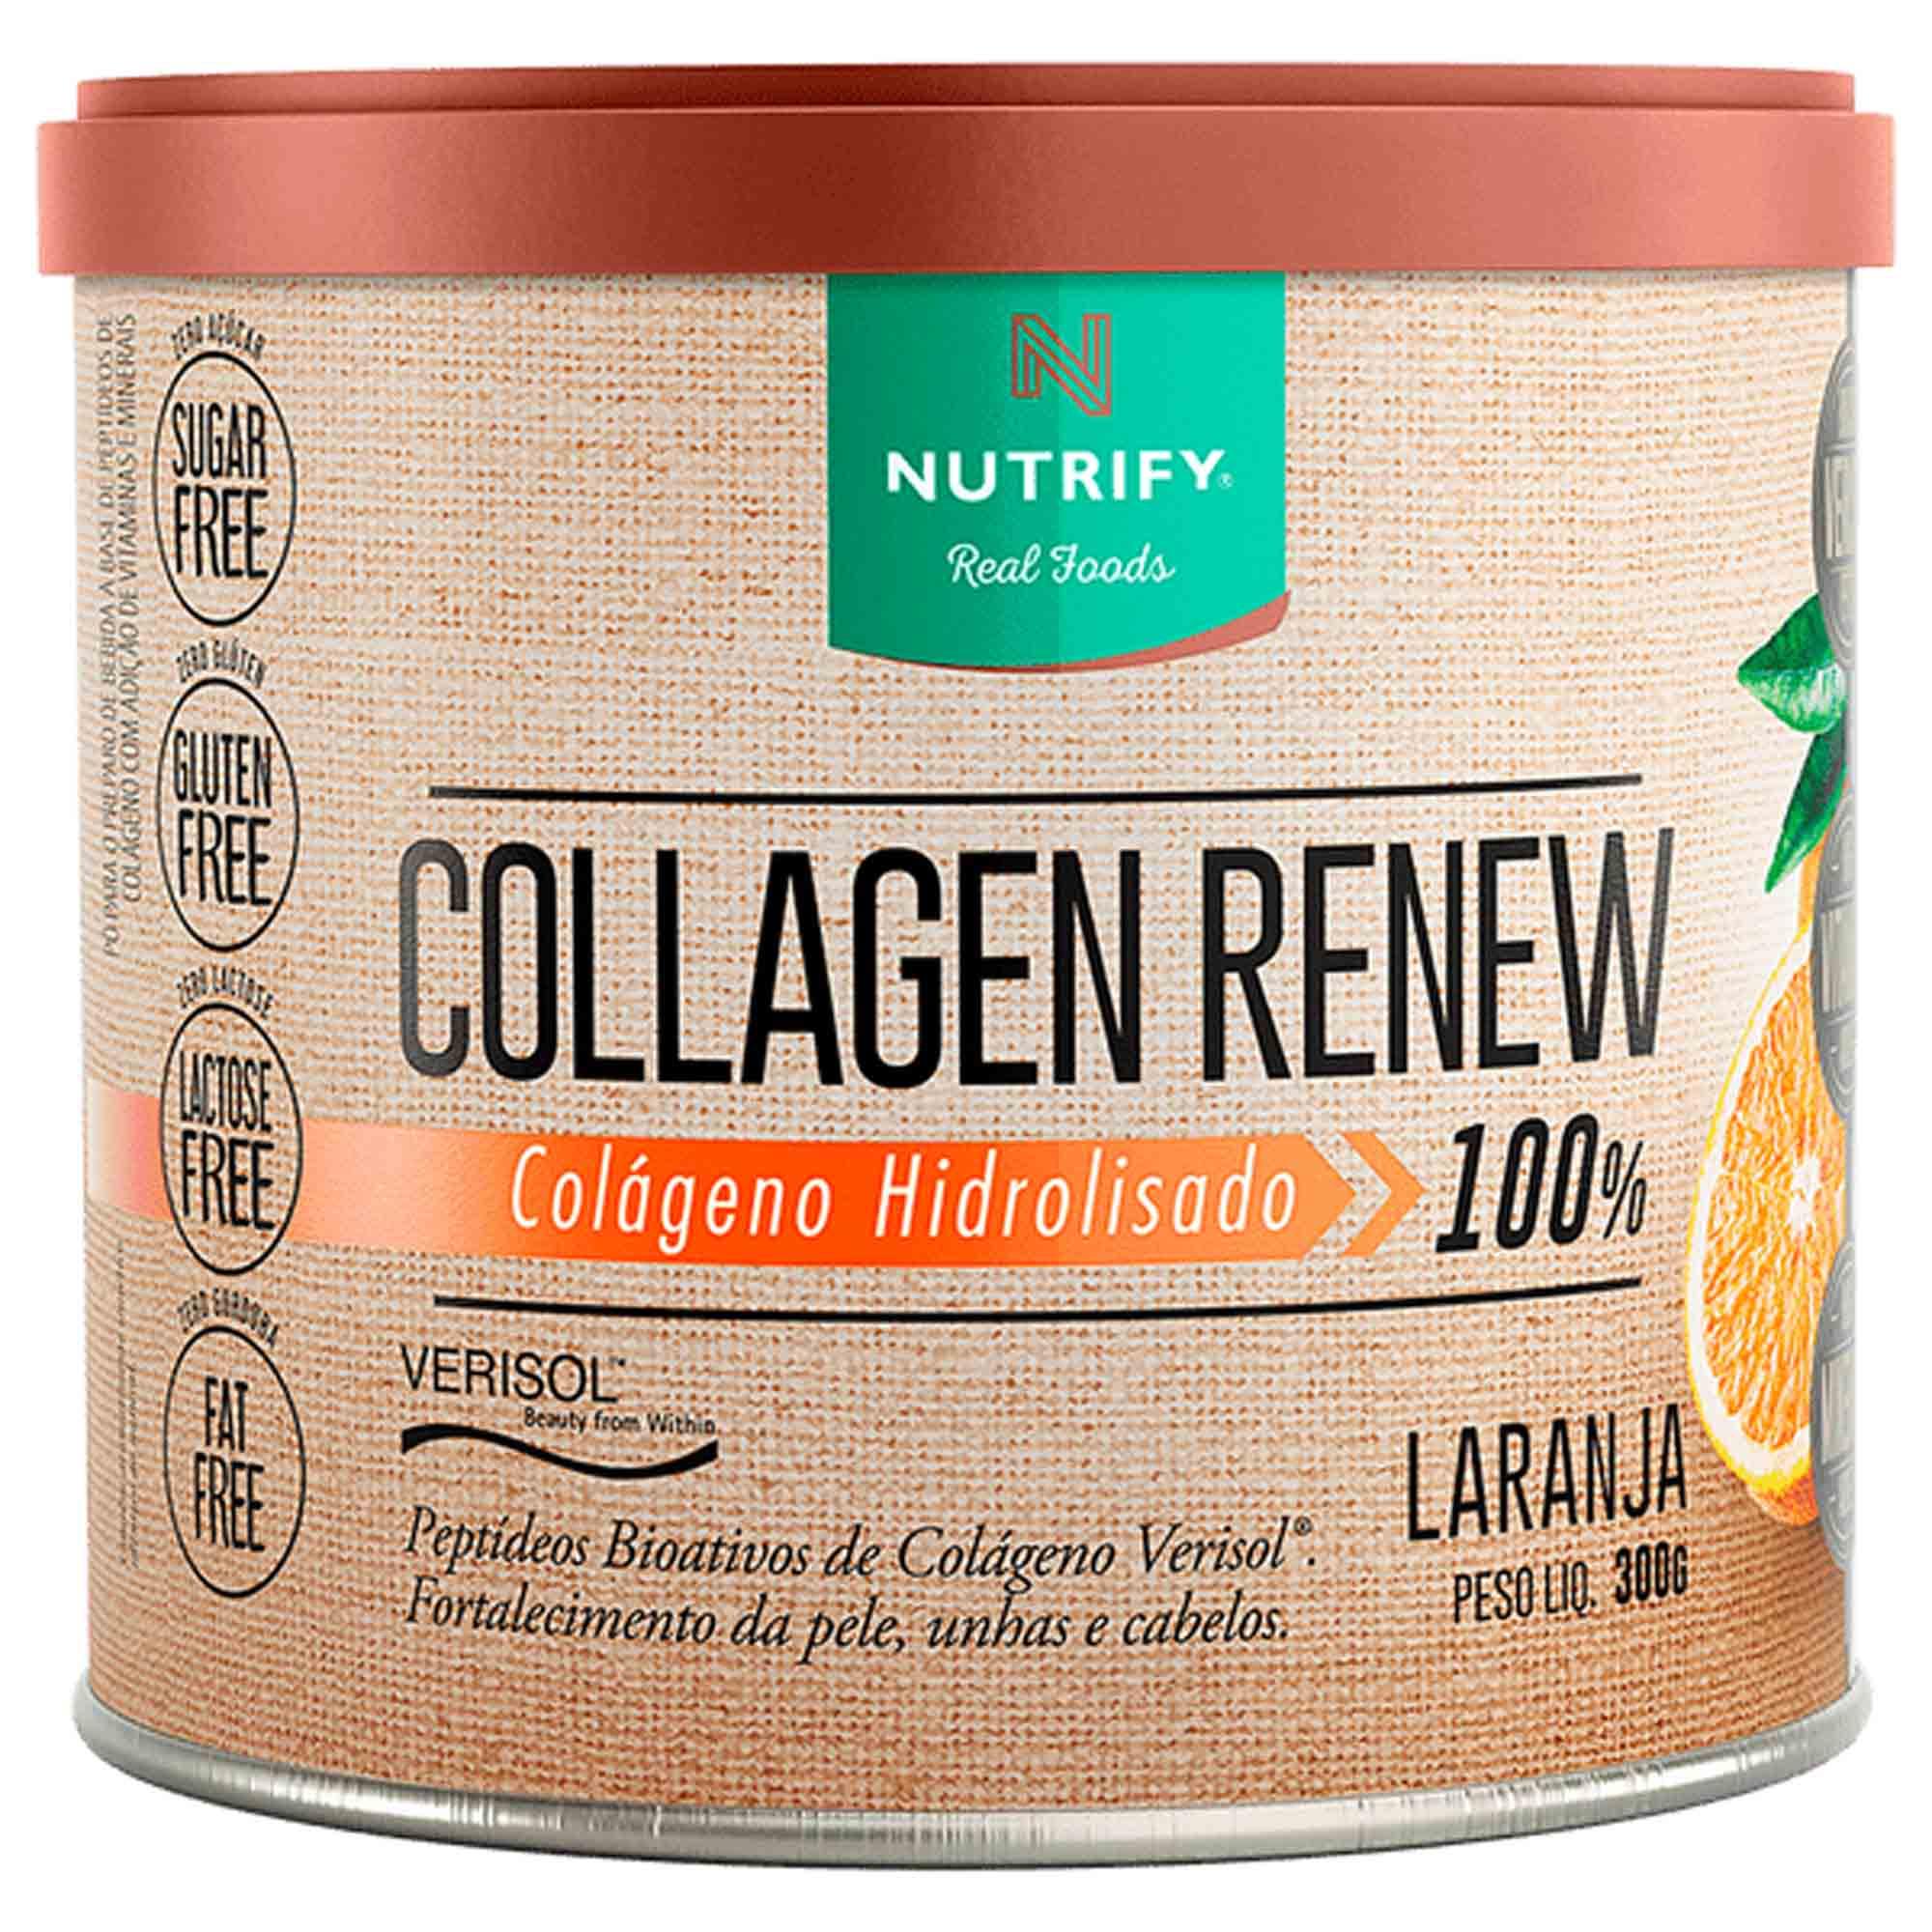 Collagen Renew sabor Laranja 300g Nutrify